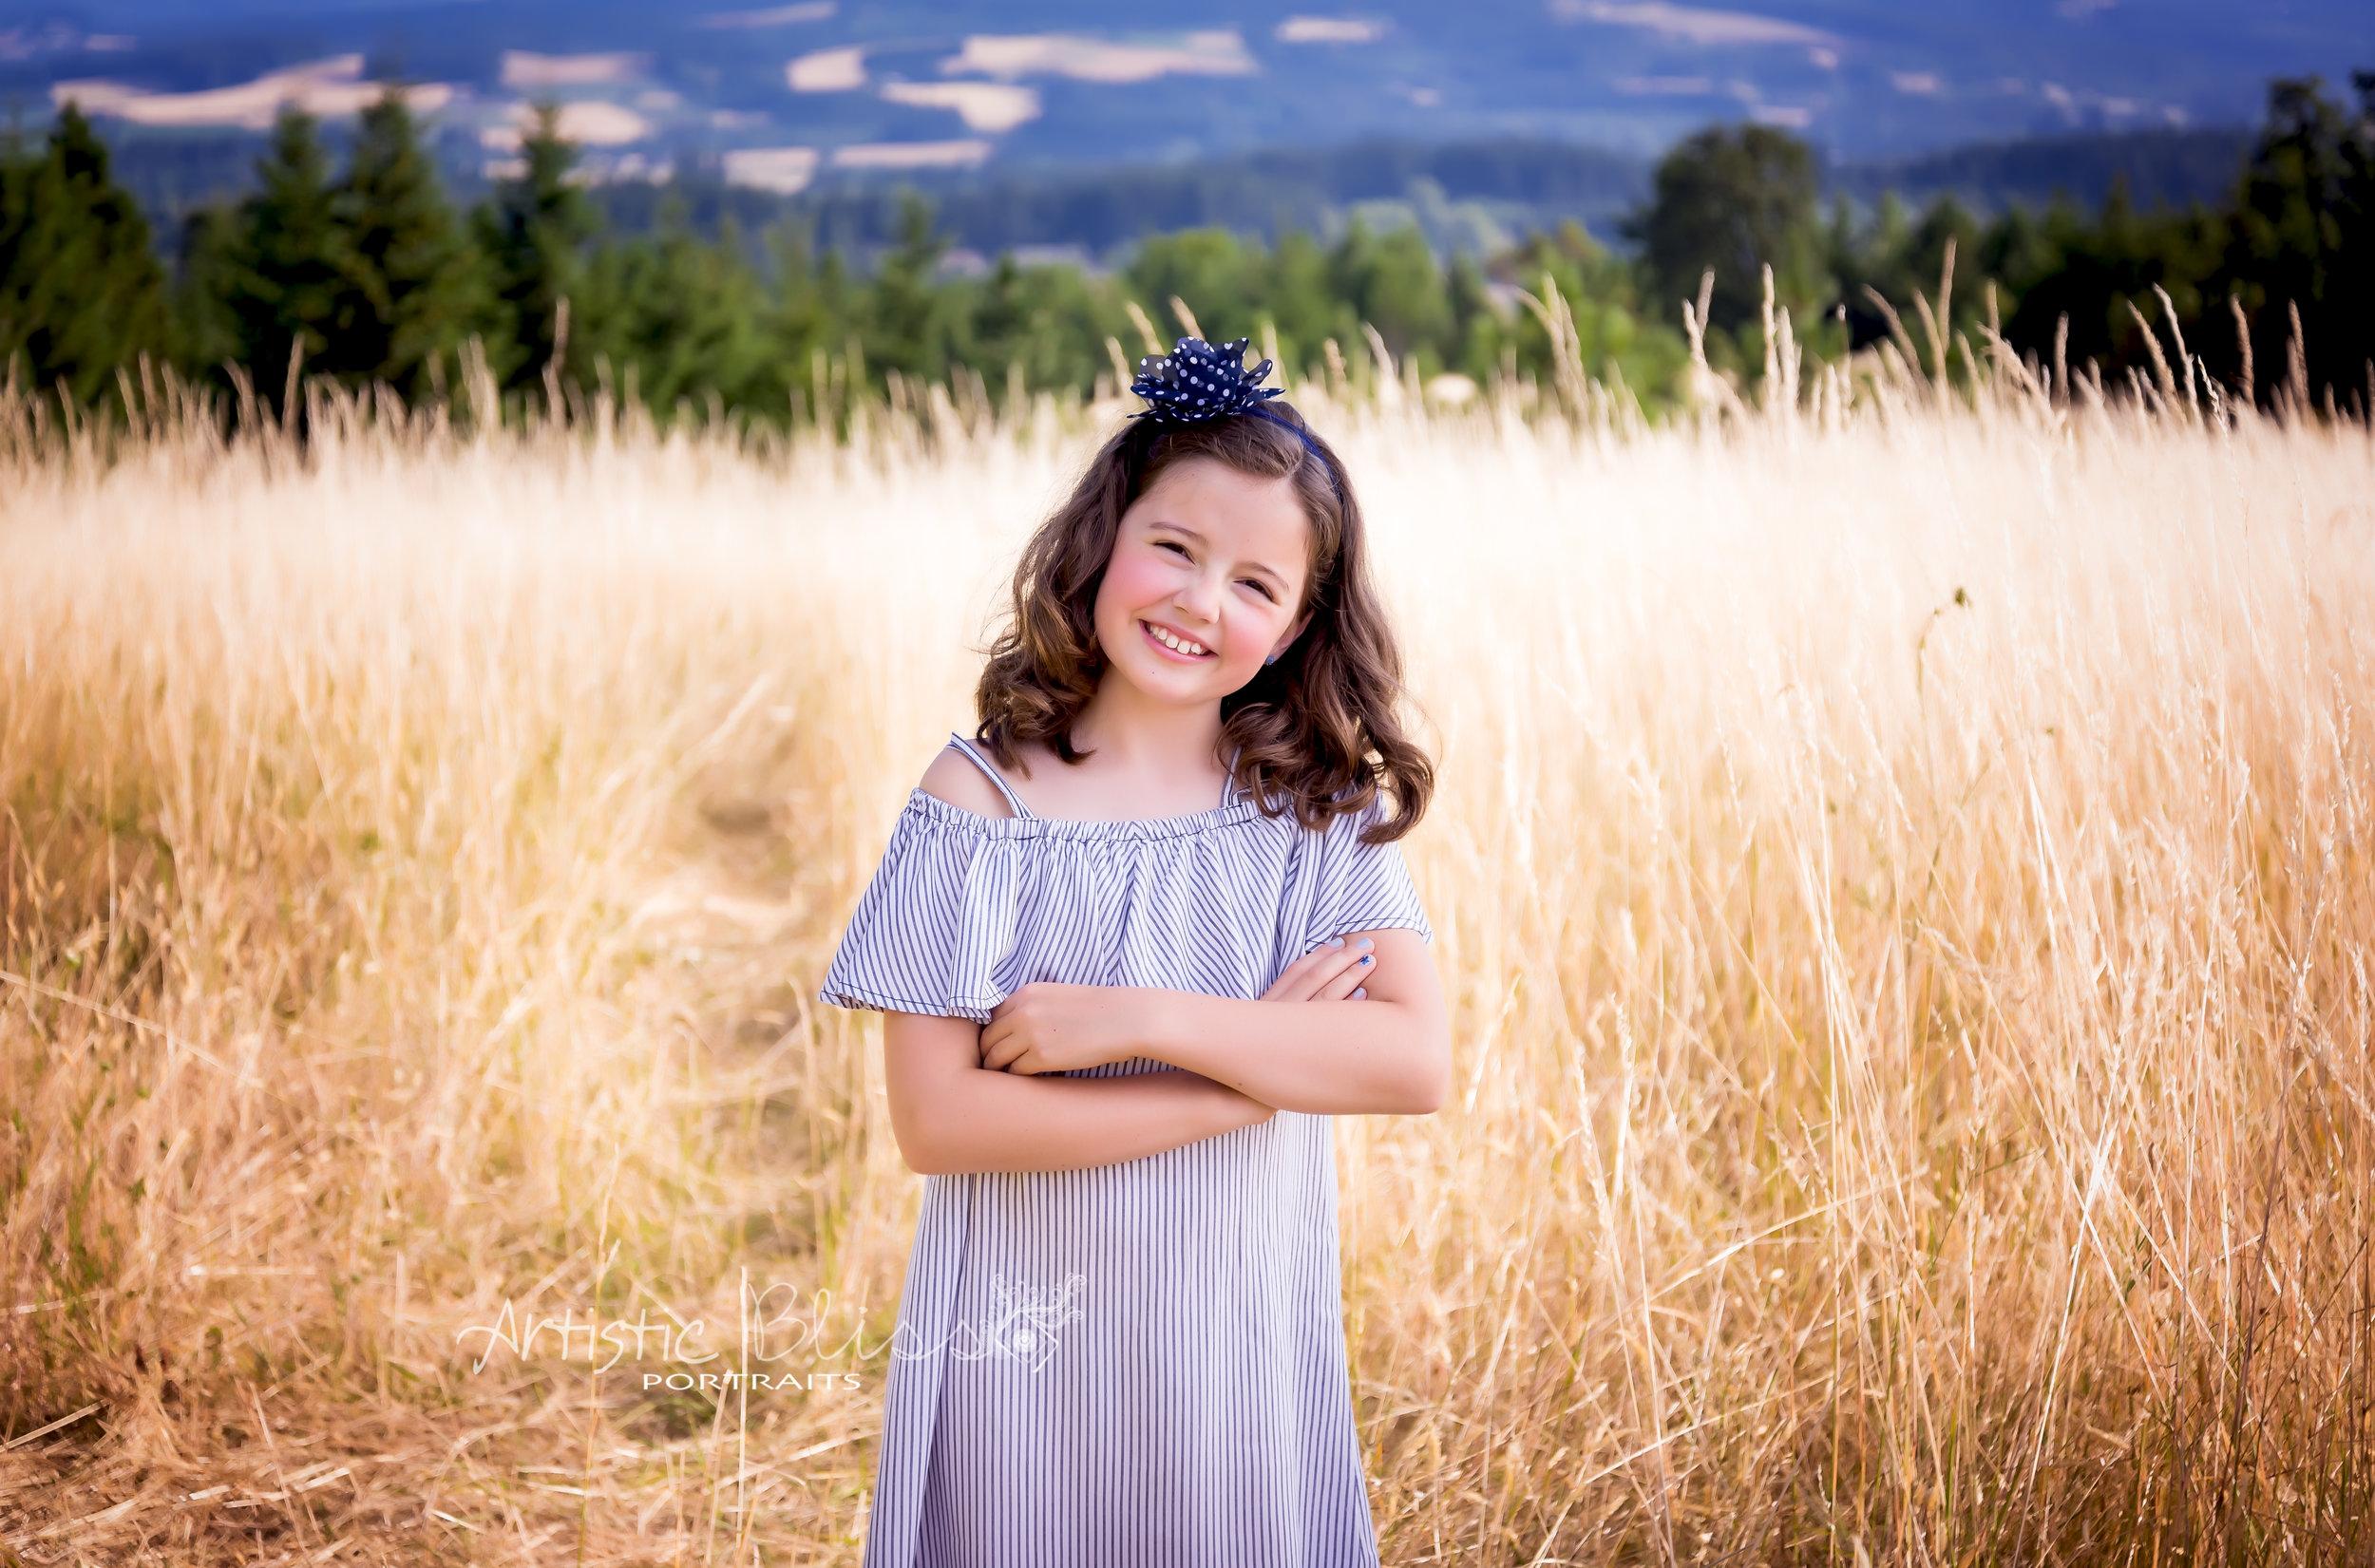 Outdoor Photography by Artistic Bliss Portraits Beaverton, Hillsboro, Cornelius, Forest Grove, Oregon